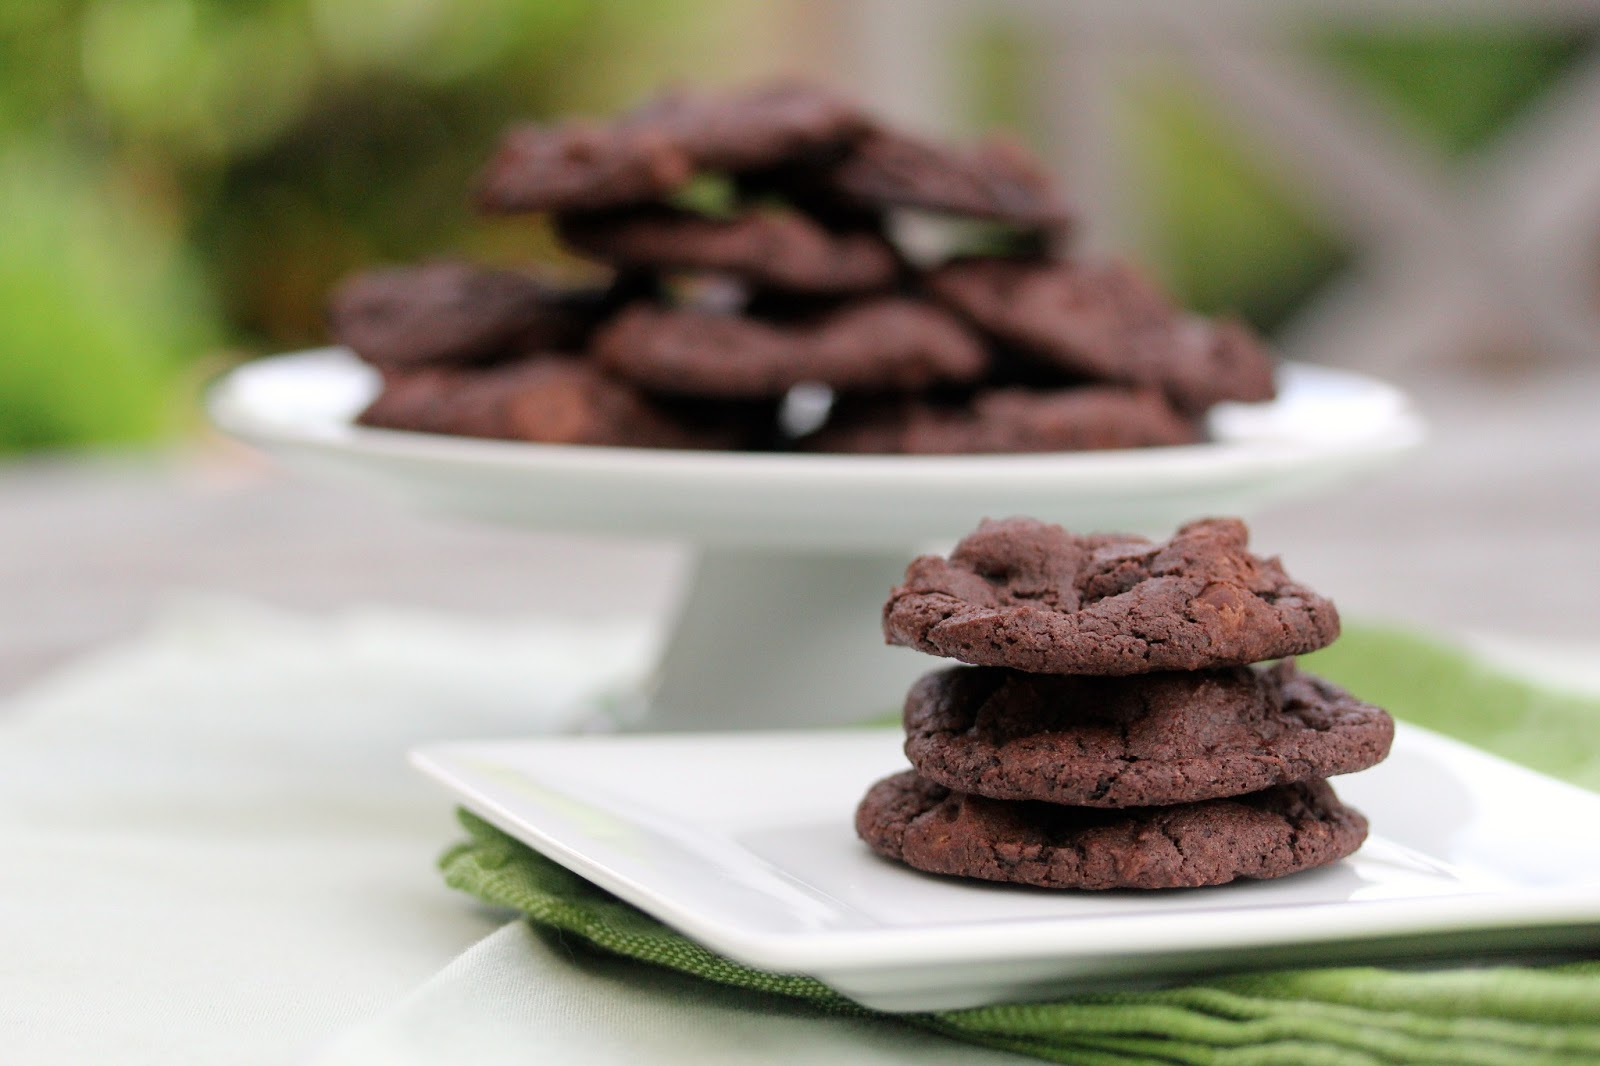 Buttermilk Chocolate Cookies #chocolateparty | Karen's Kitchen Stories